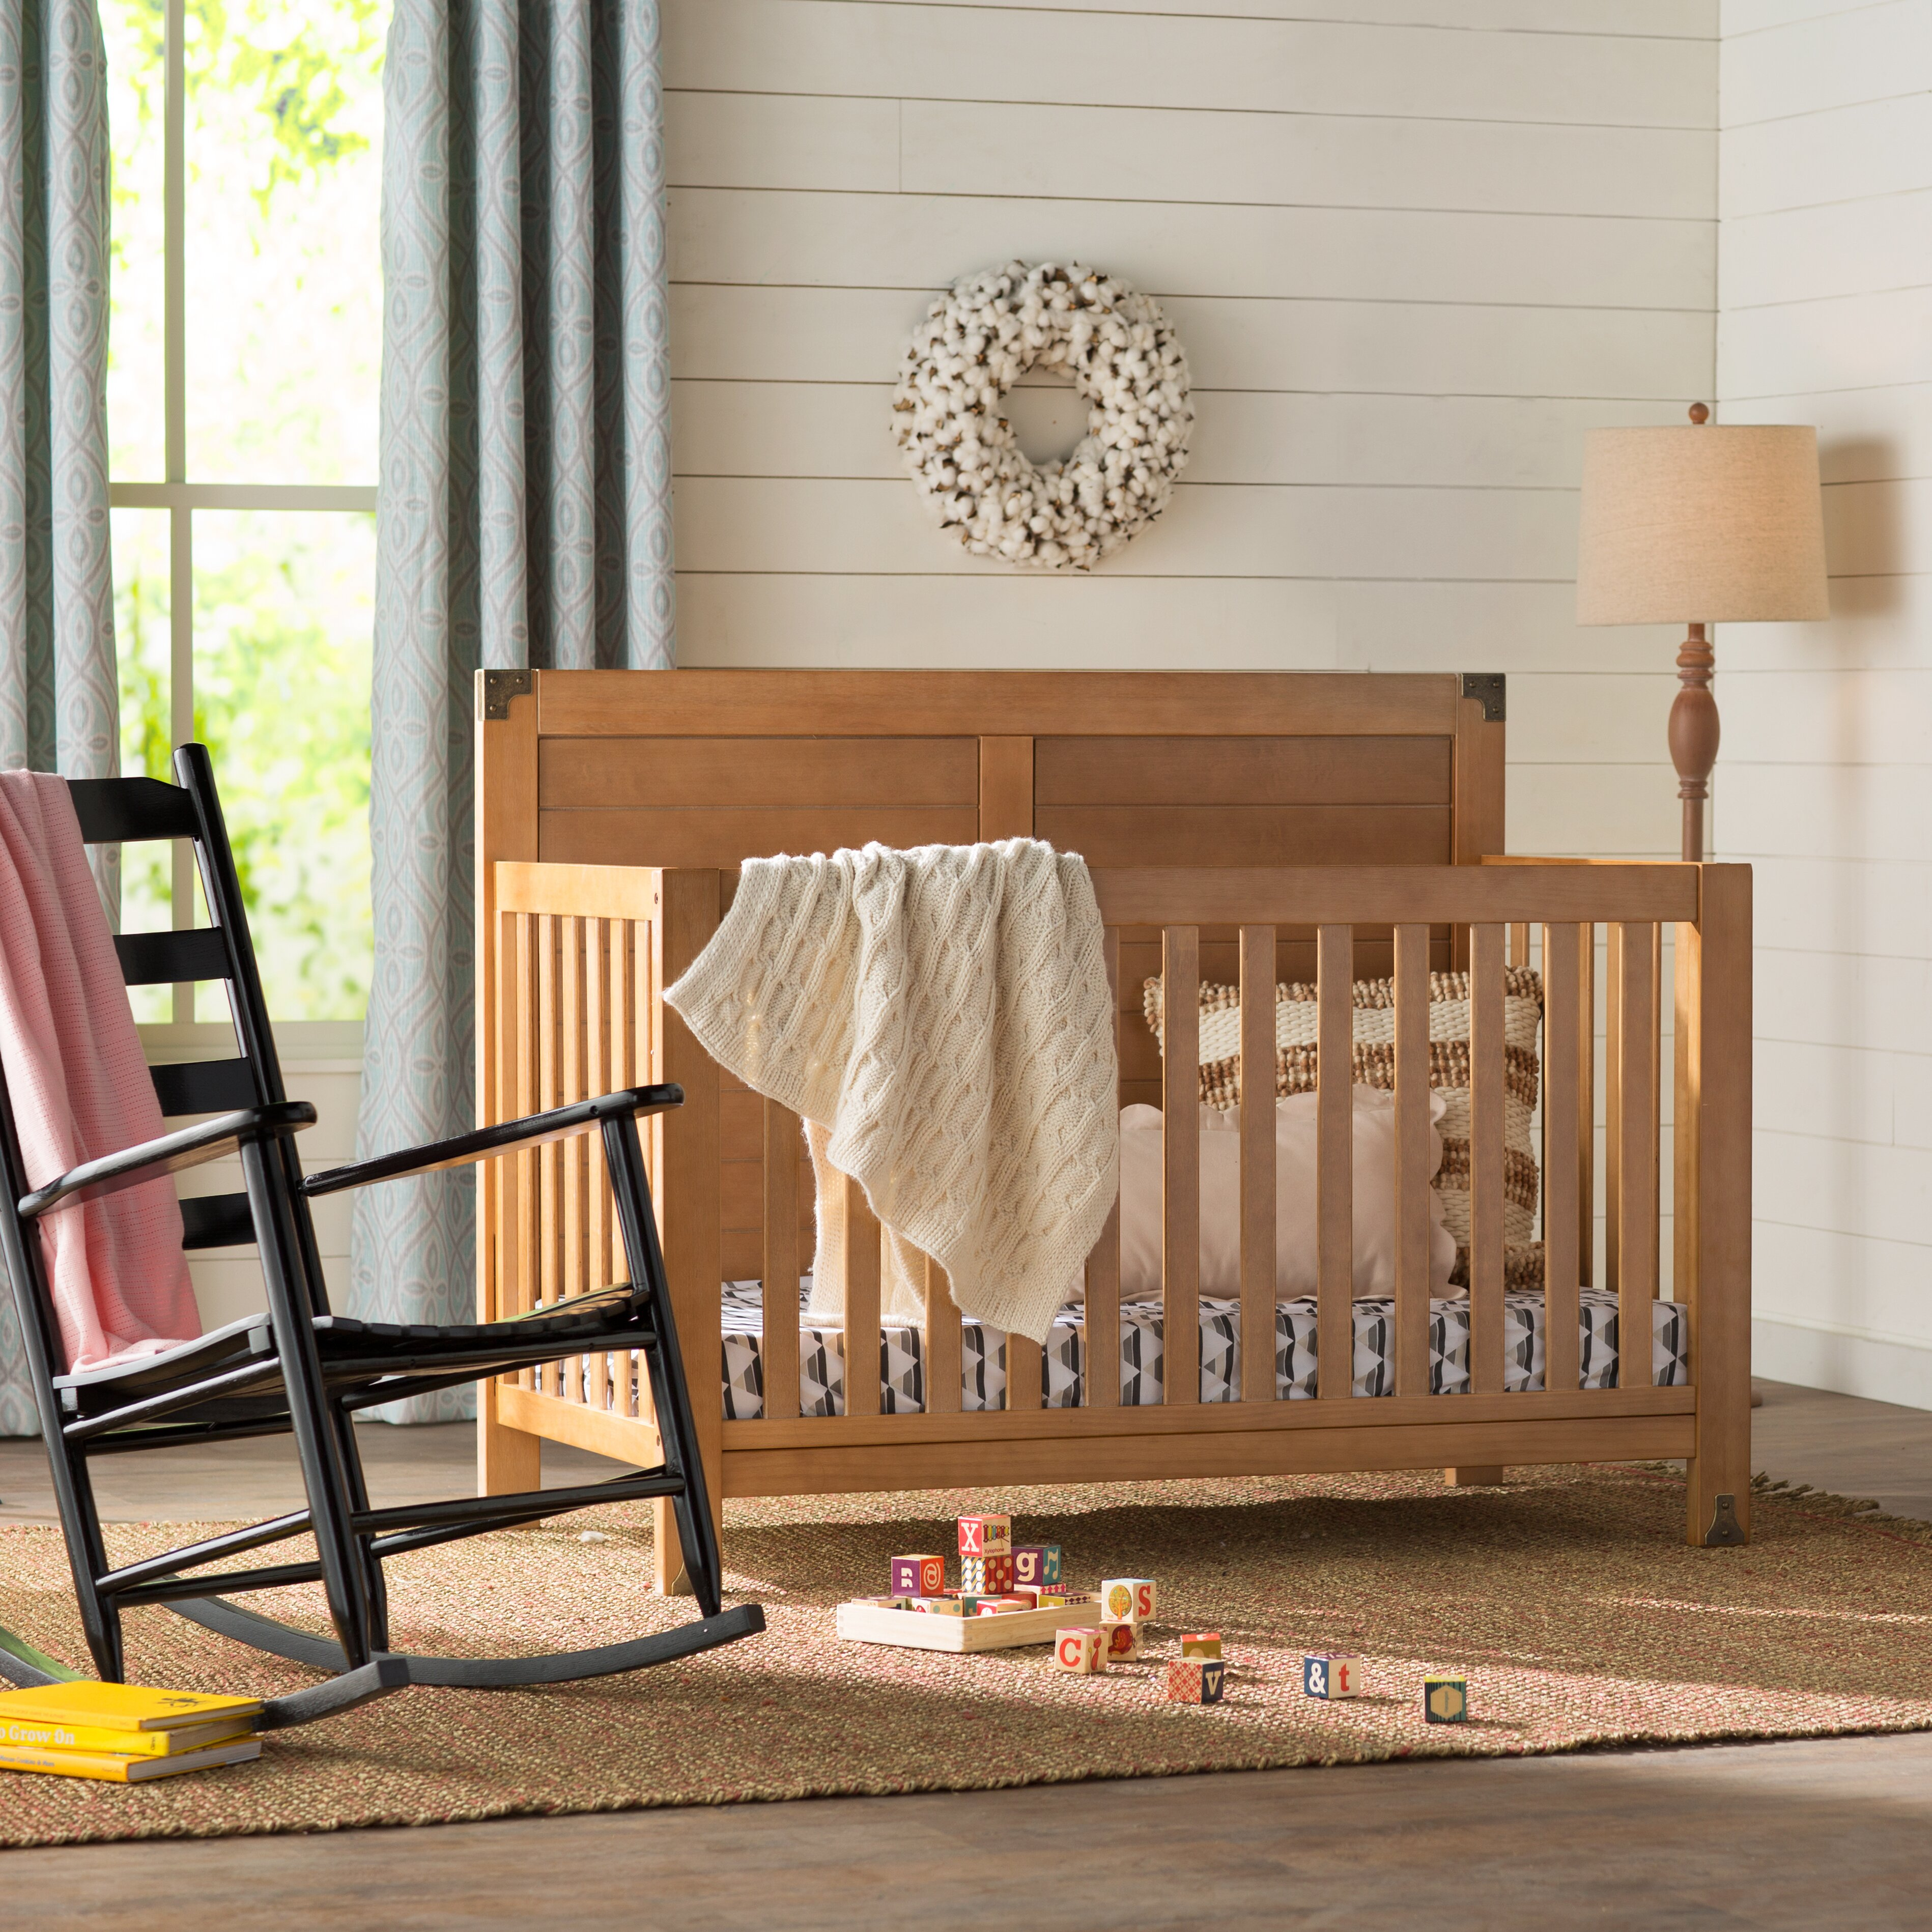 Emma iron crib for sale - Viv Rae Trade Forrest 4 In 1 Convertible Crib